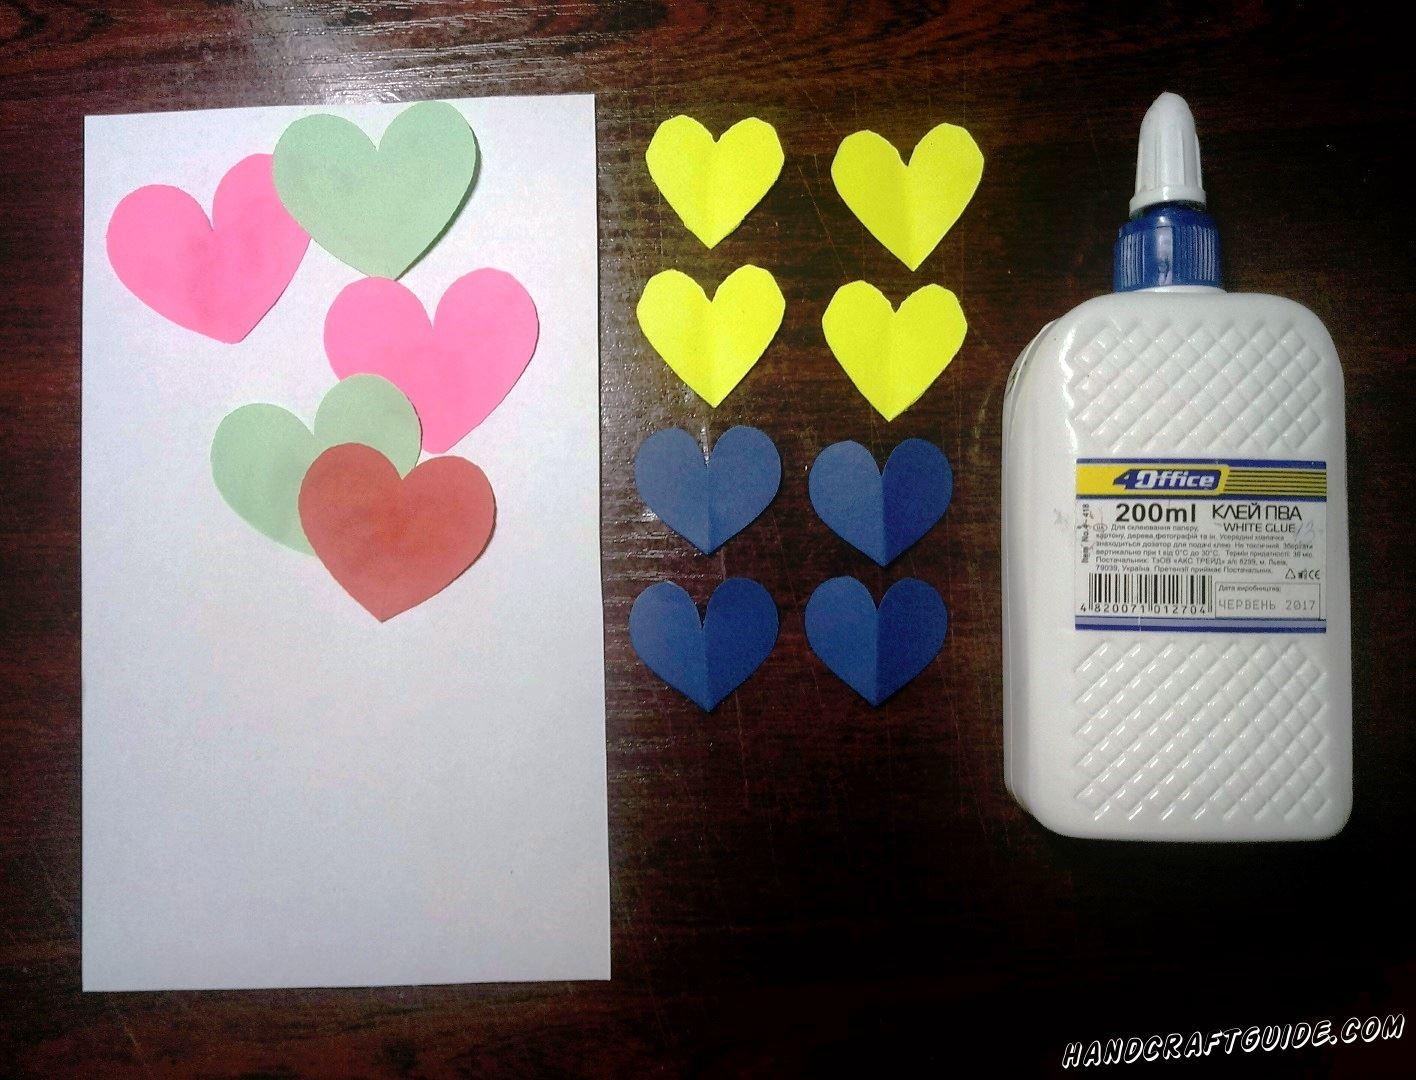 Наклеиваем наши сердечки, на верхней части белого листа бумаги.